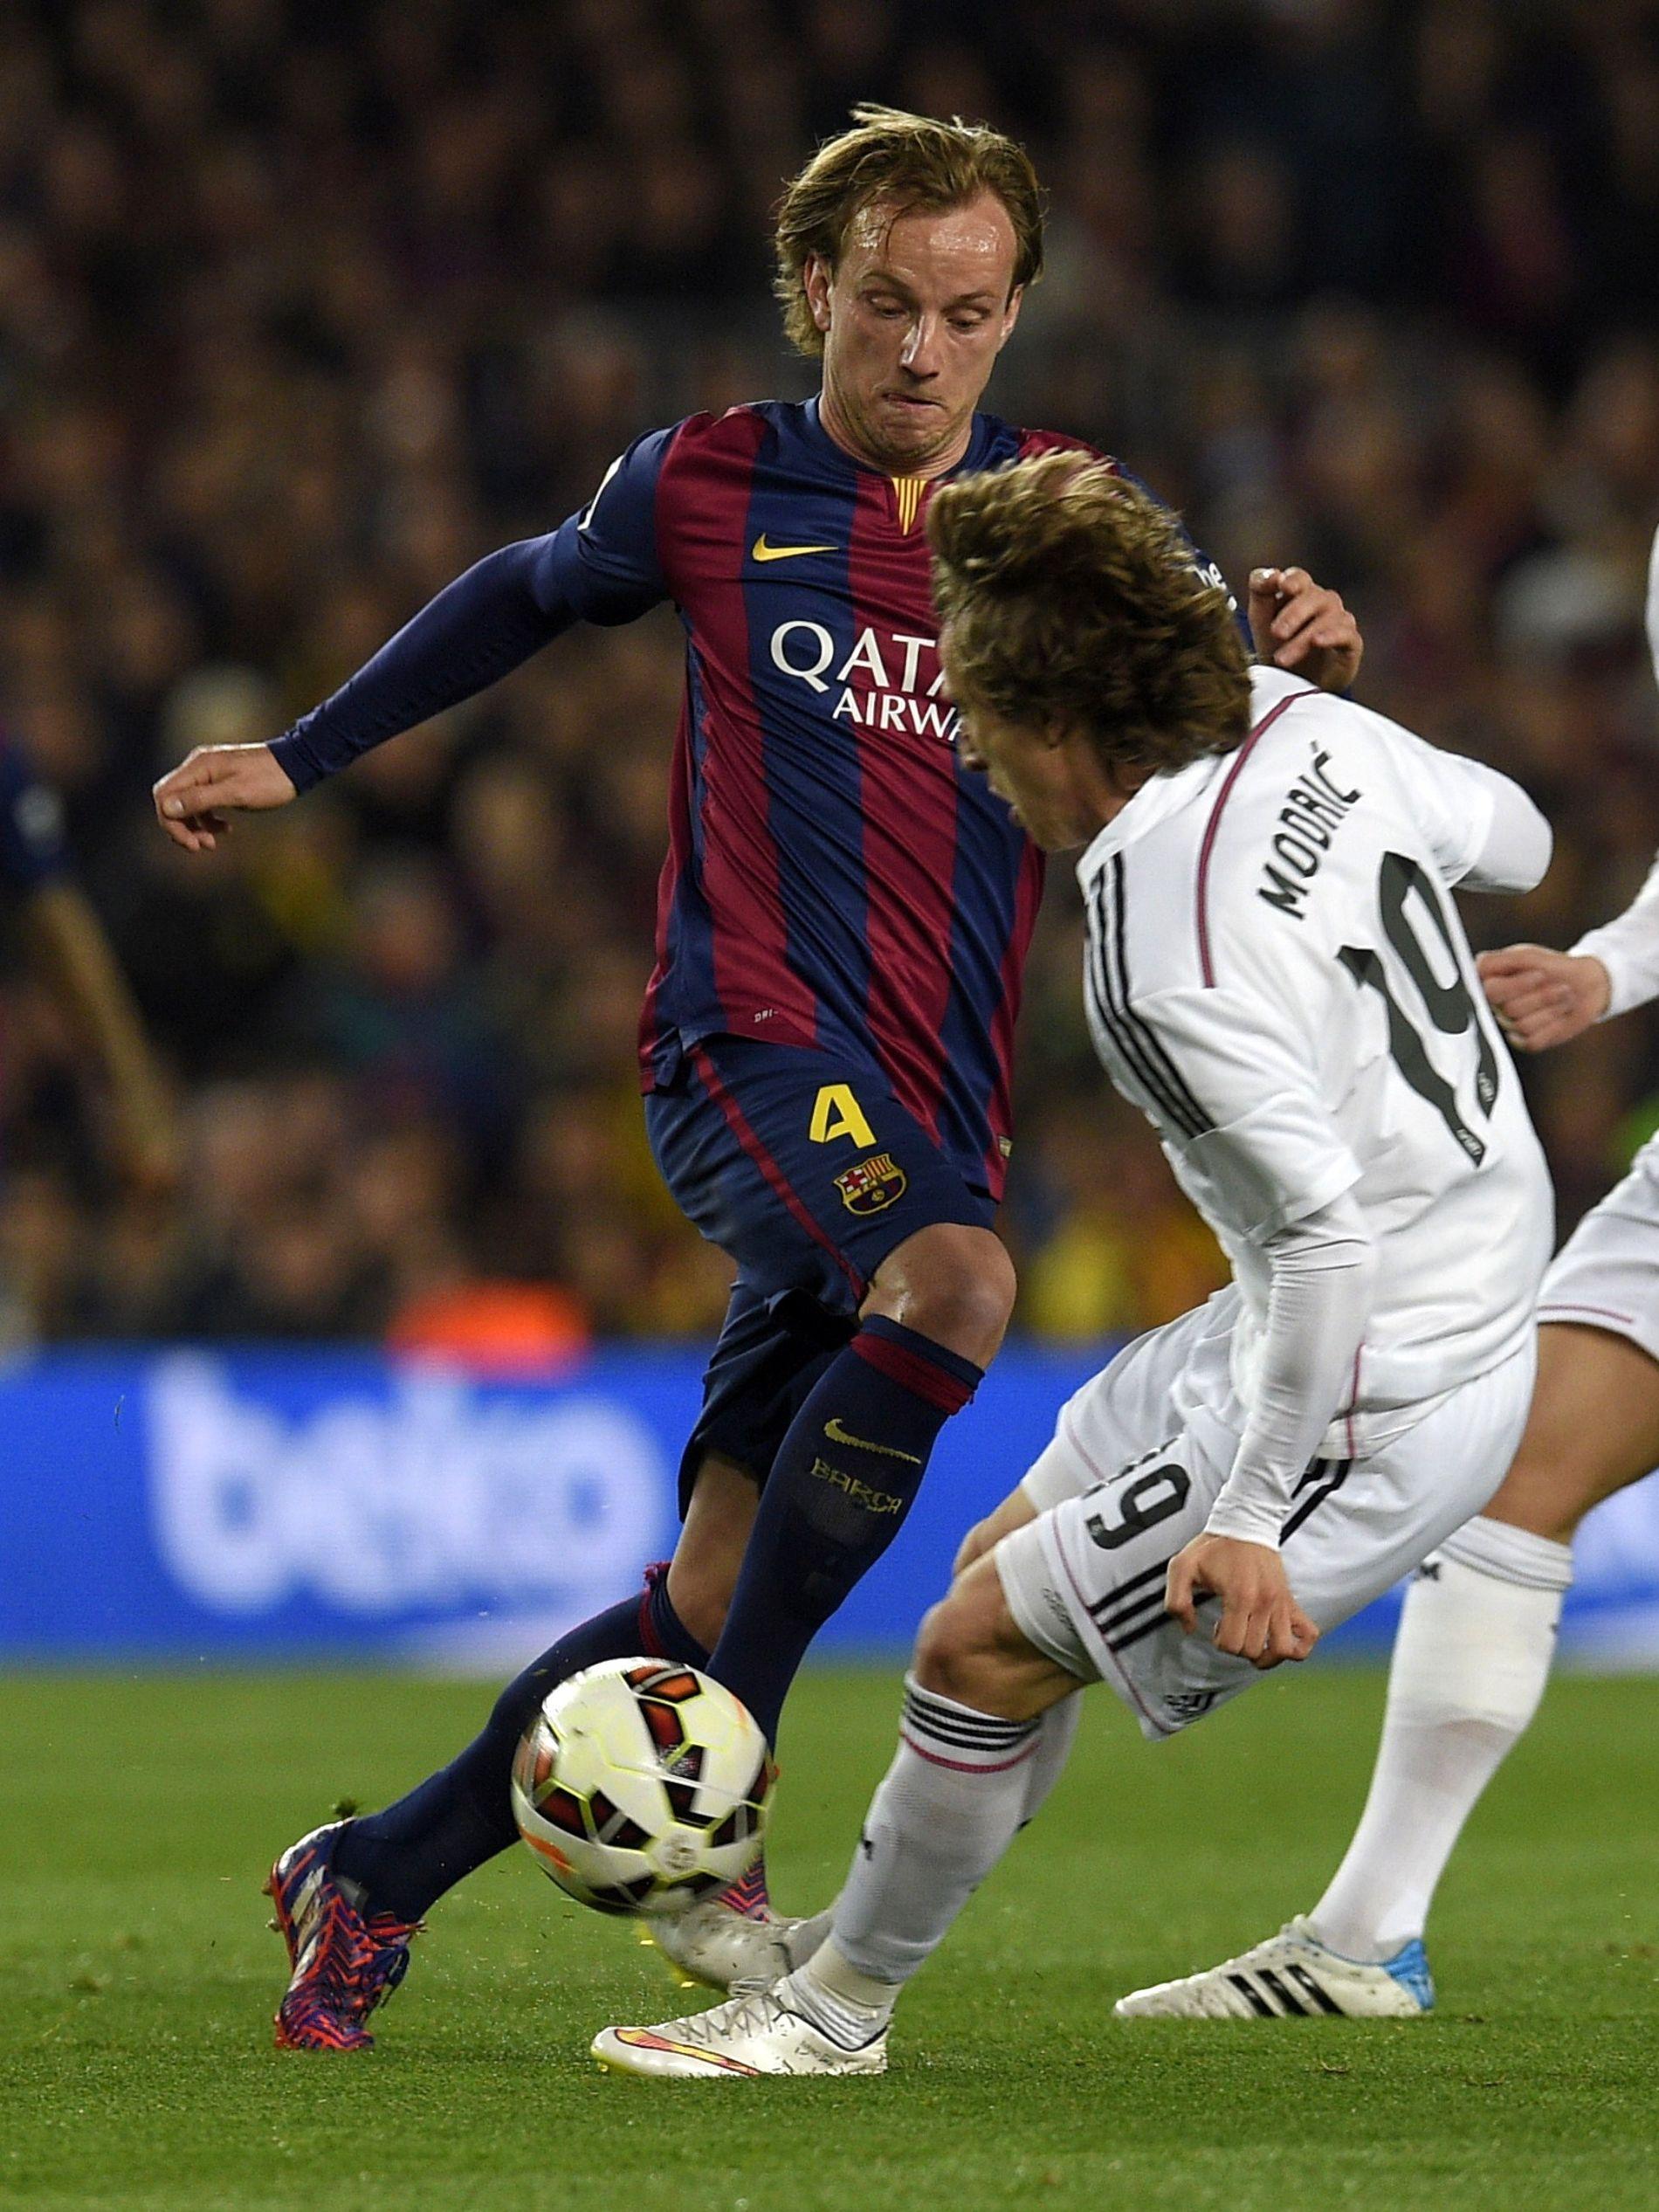 FIENDER I SPANIA: Ivan Rakitic (Barcelona) og Luka Modric (Real Madrid) er bitre fiender på gresset i spanske La Liga, men på landslaget er de kompiser.